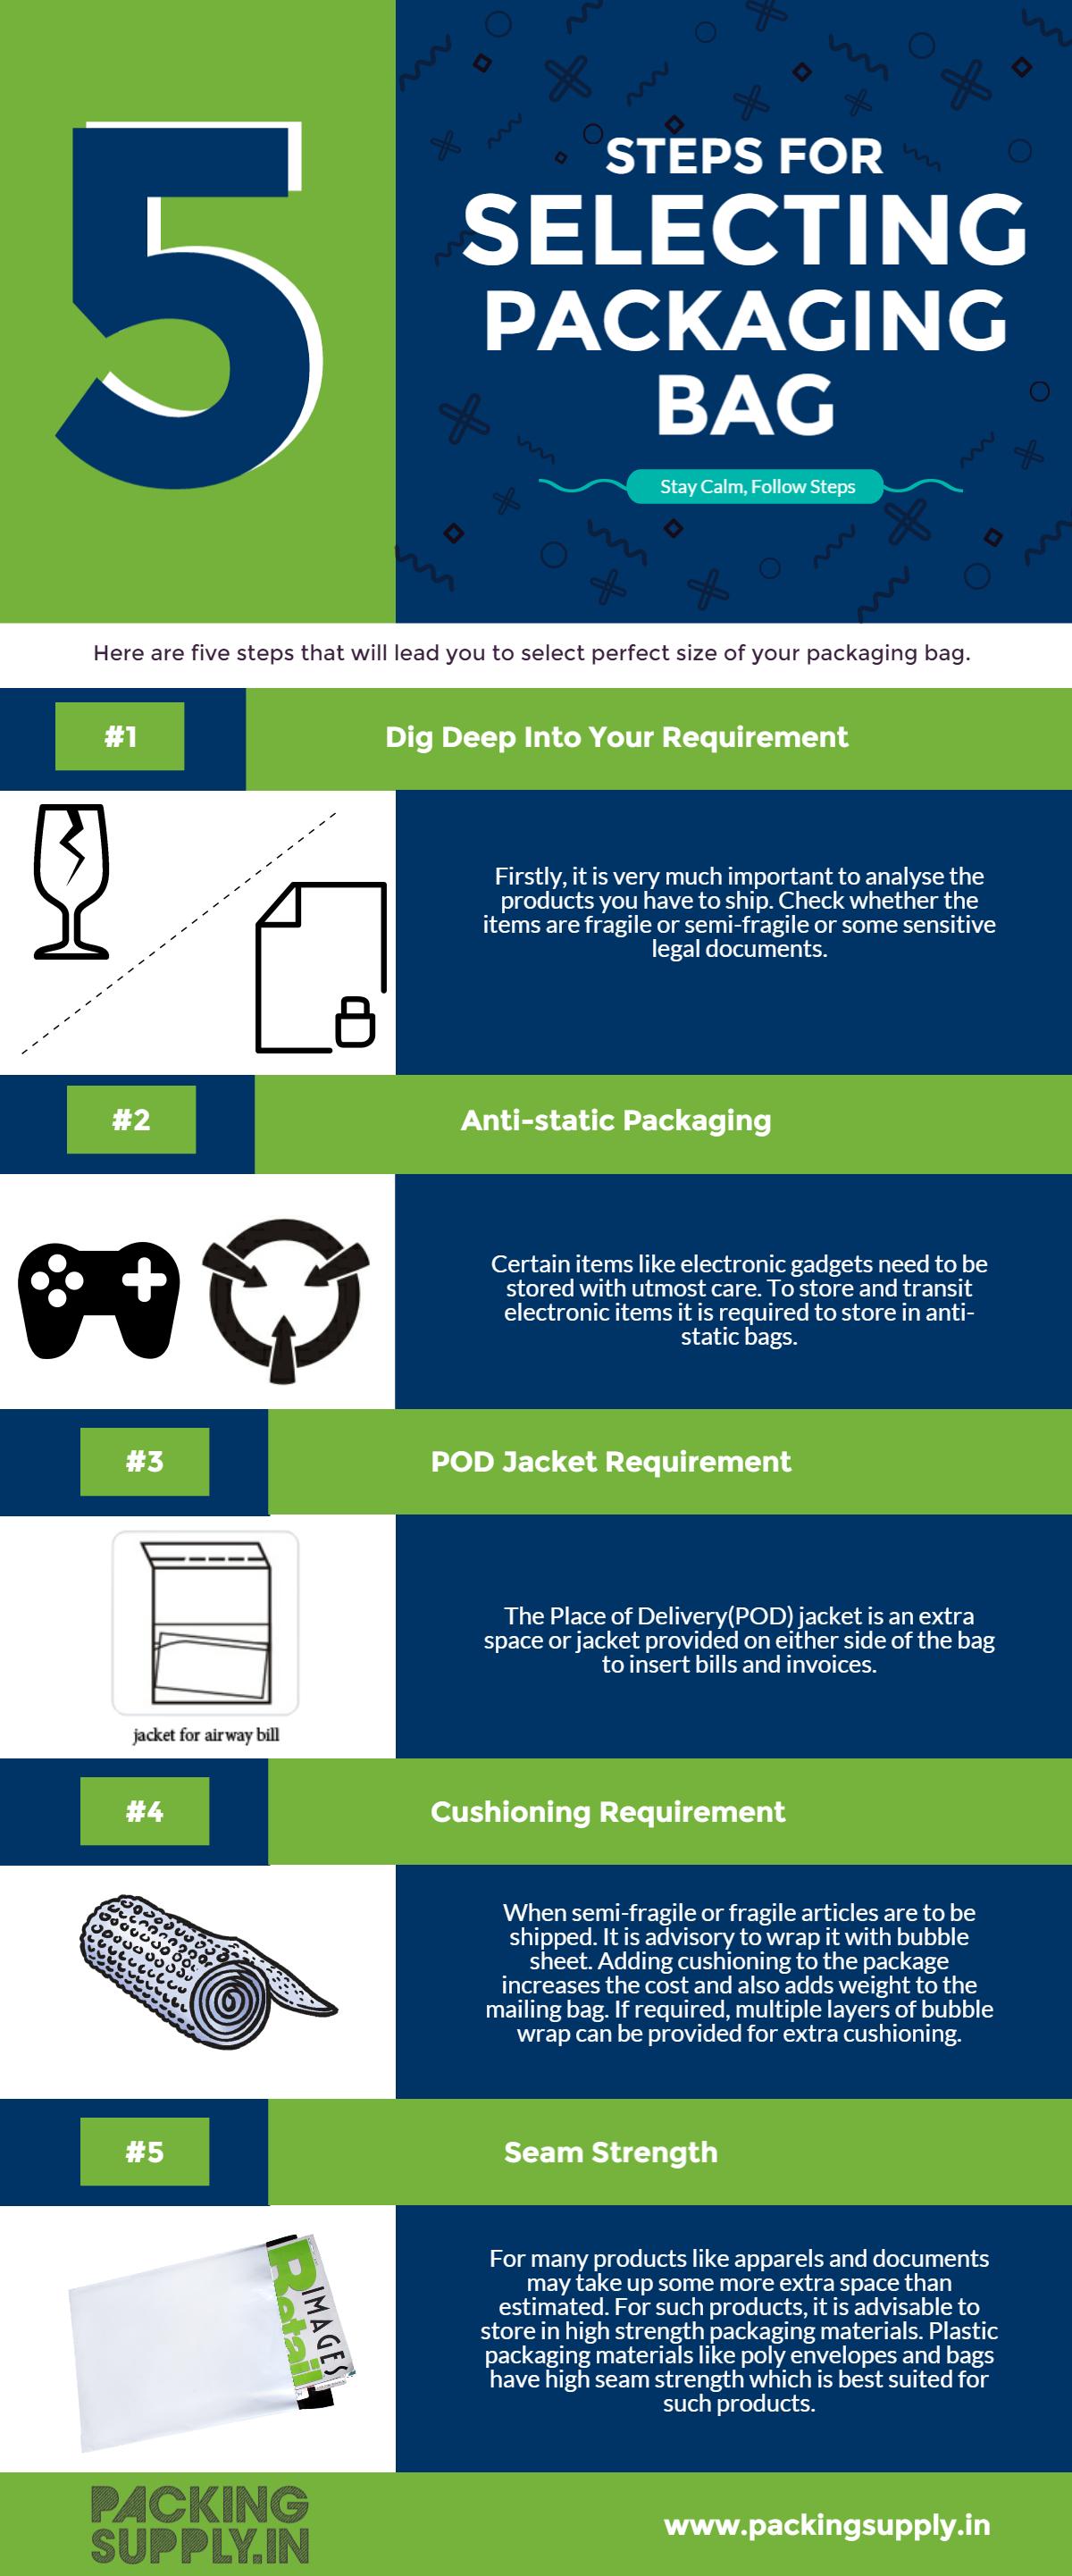 5 Steps For Selecting Packaging Bag